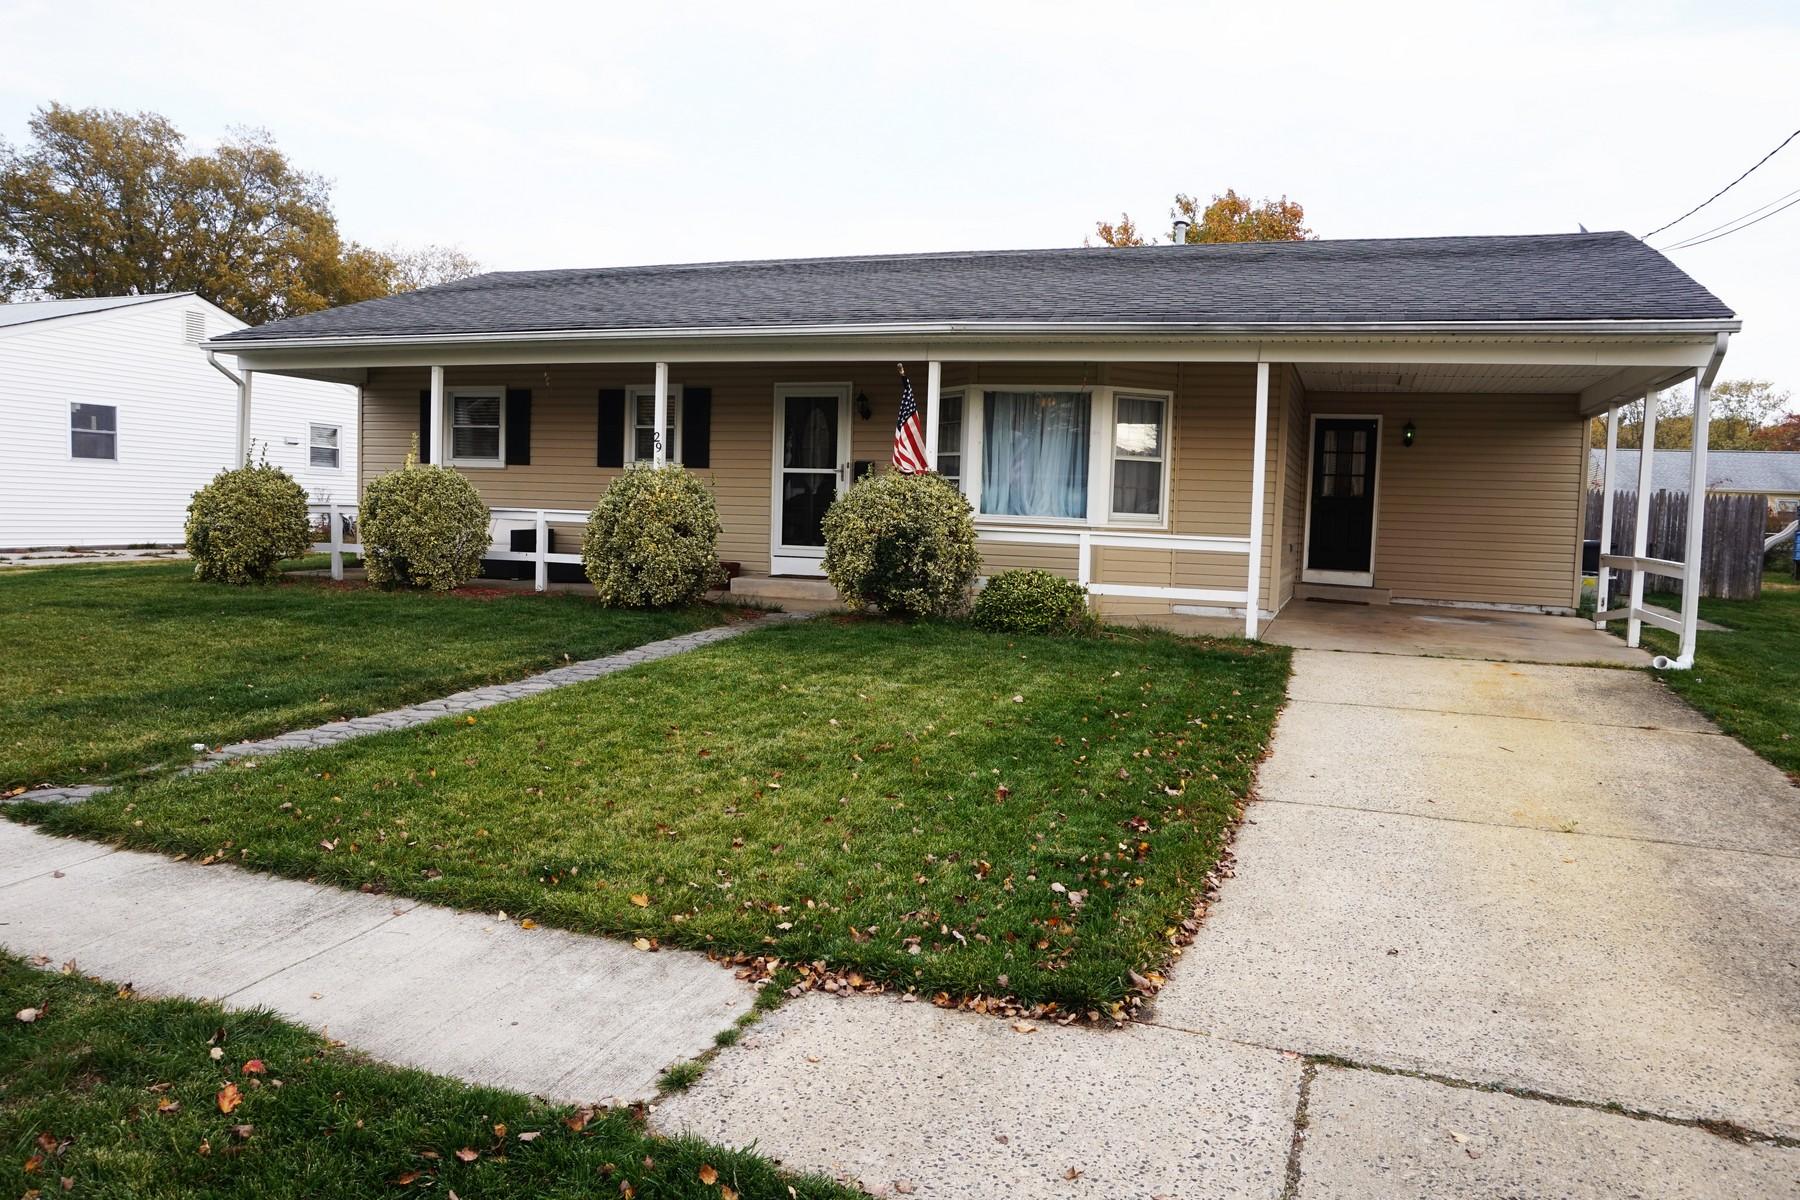 独户住宅 为 销售 在 Perfect Starter Home 29 Gulph Mill Road Somers Point, 08244 美国